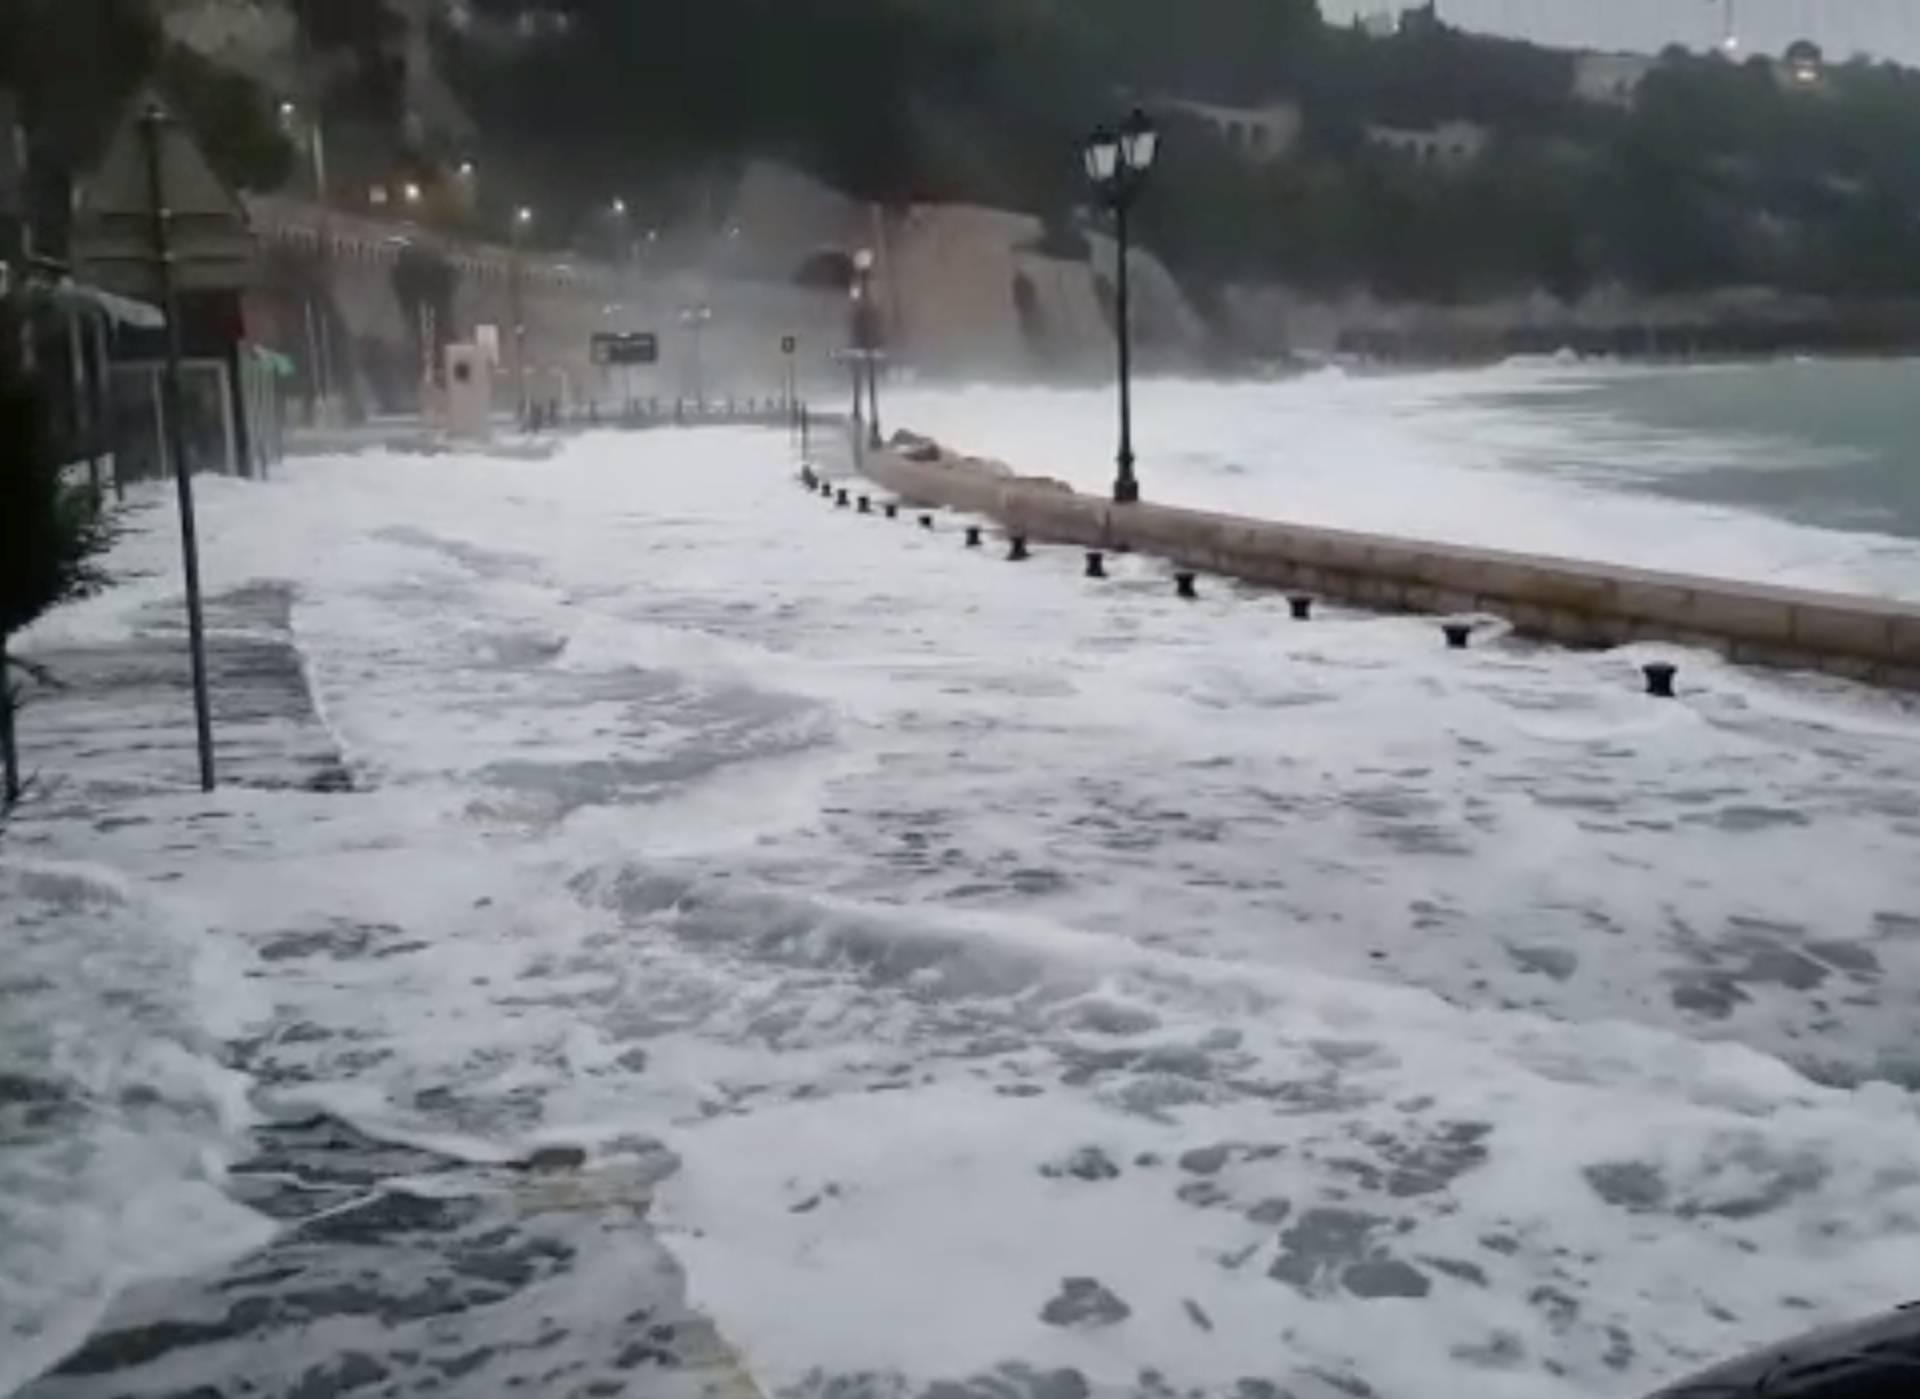 Waves flood the street in Villefranche-Sur-Mer